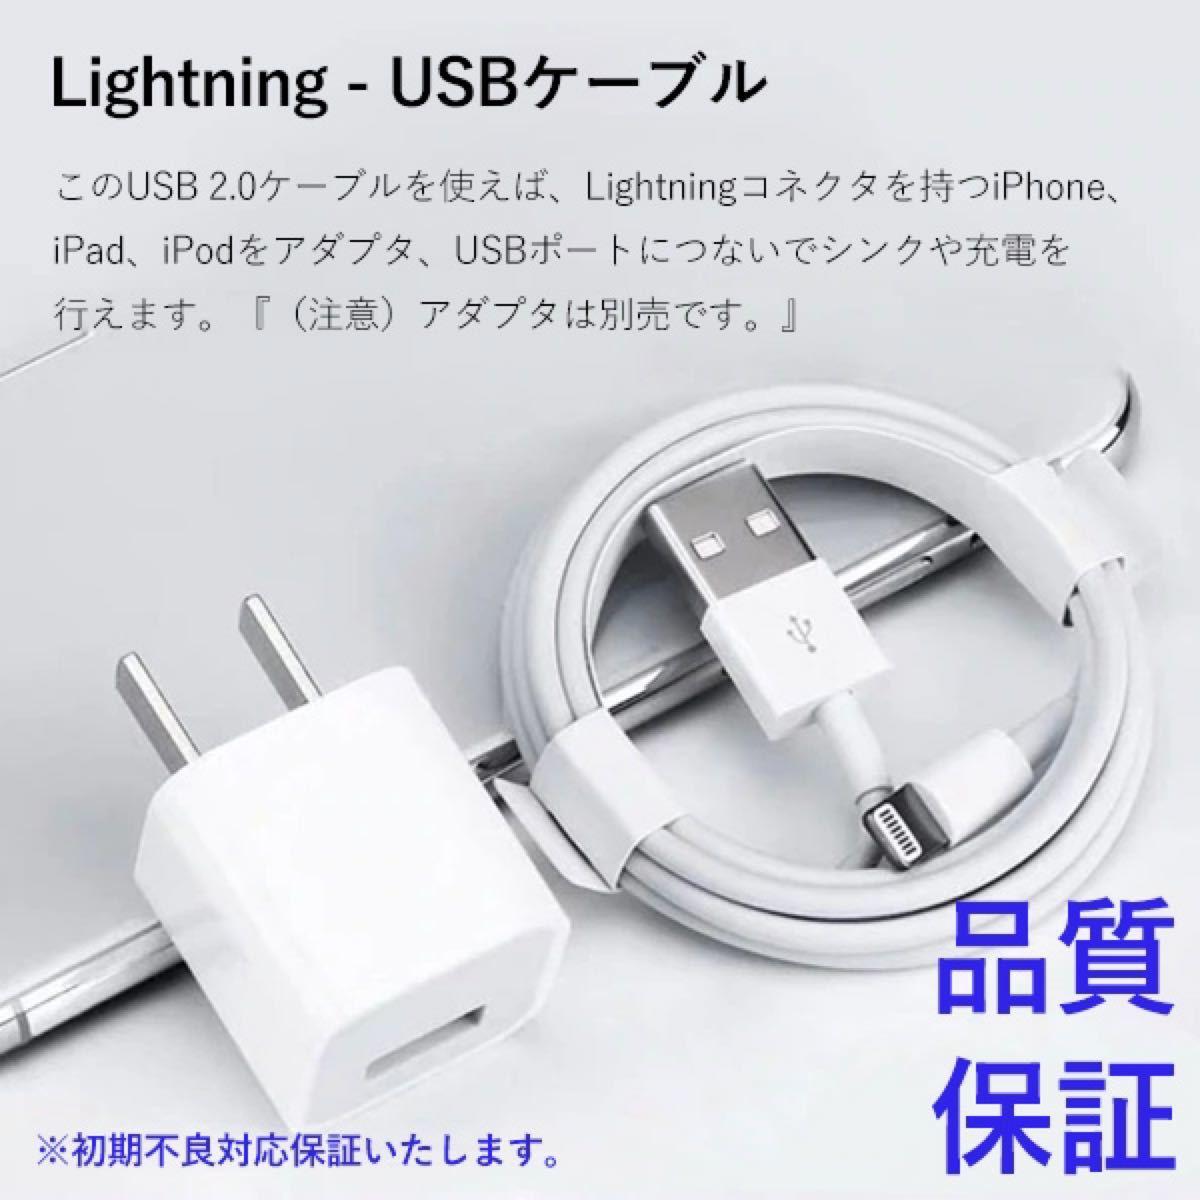 iPhone 充電器 ライトニングケーブル 1m apple 純正品質 データ転送 Lightning iPhone ライトニング